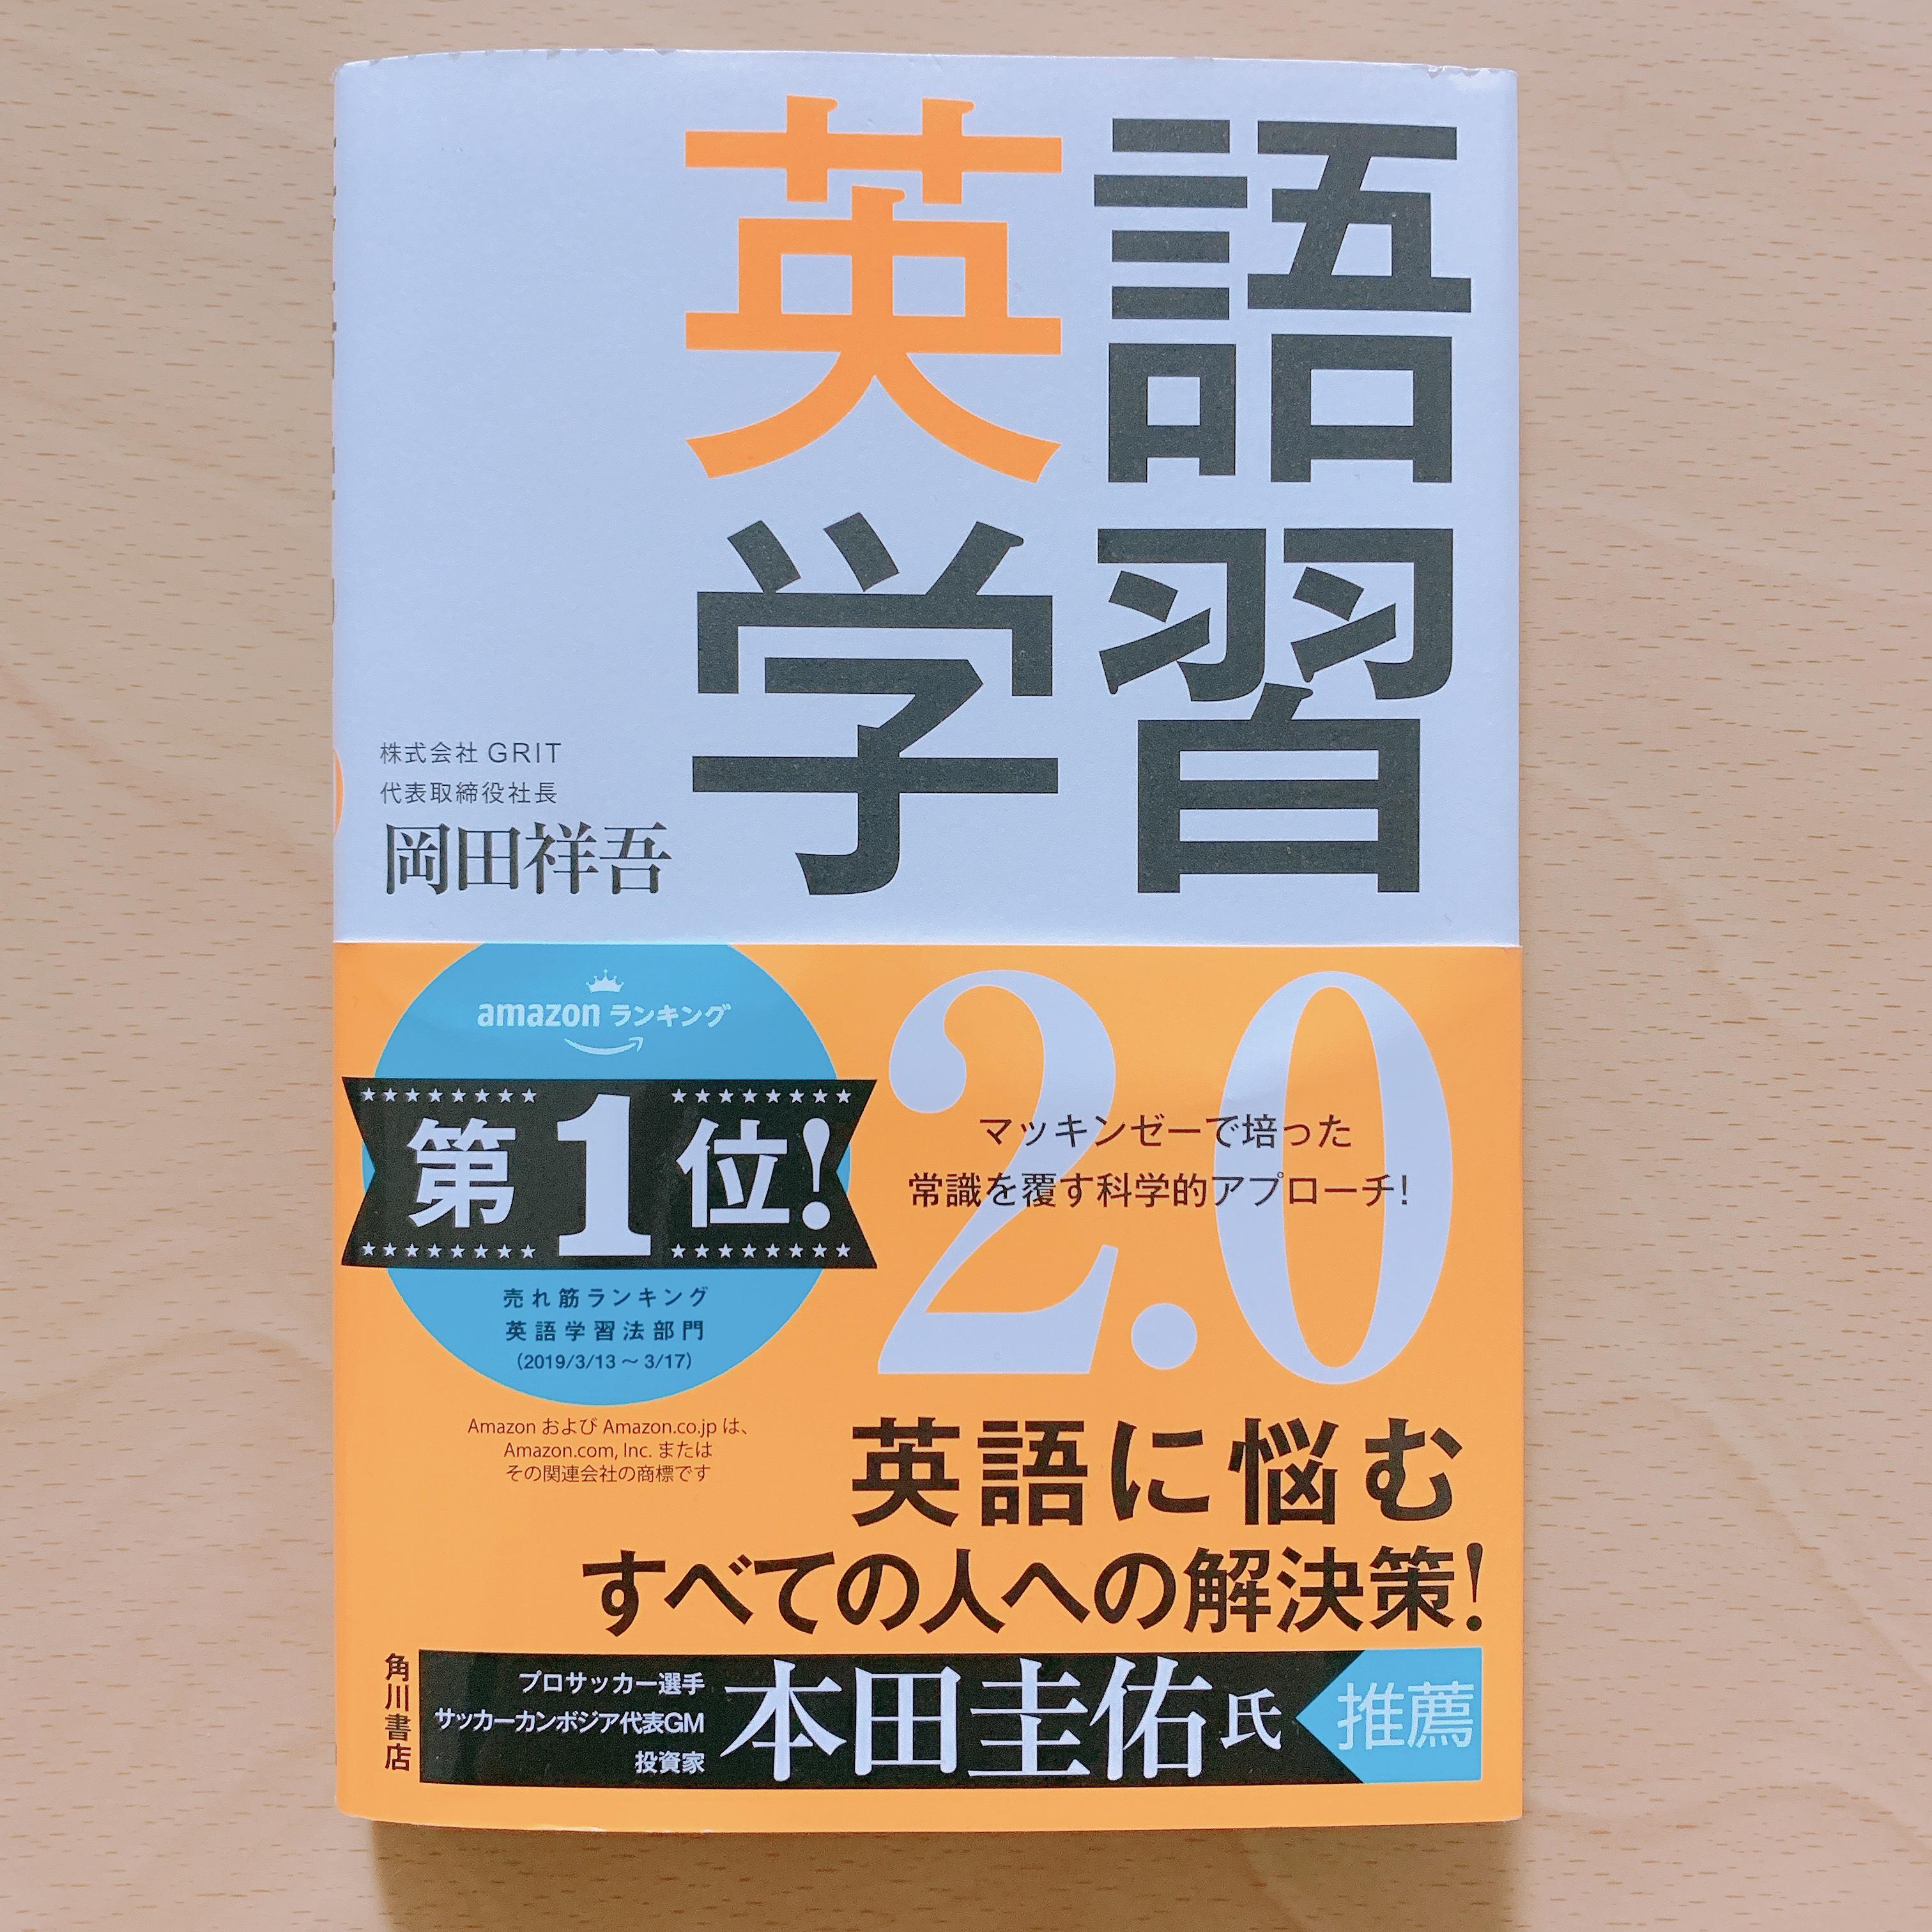 img 1084 - 「英語学習2.0」を読んで。